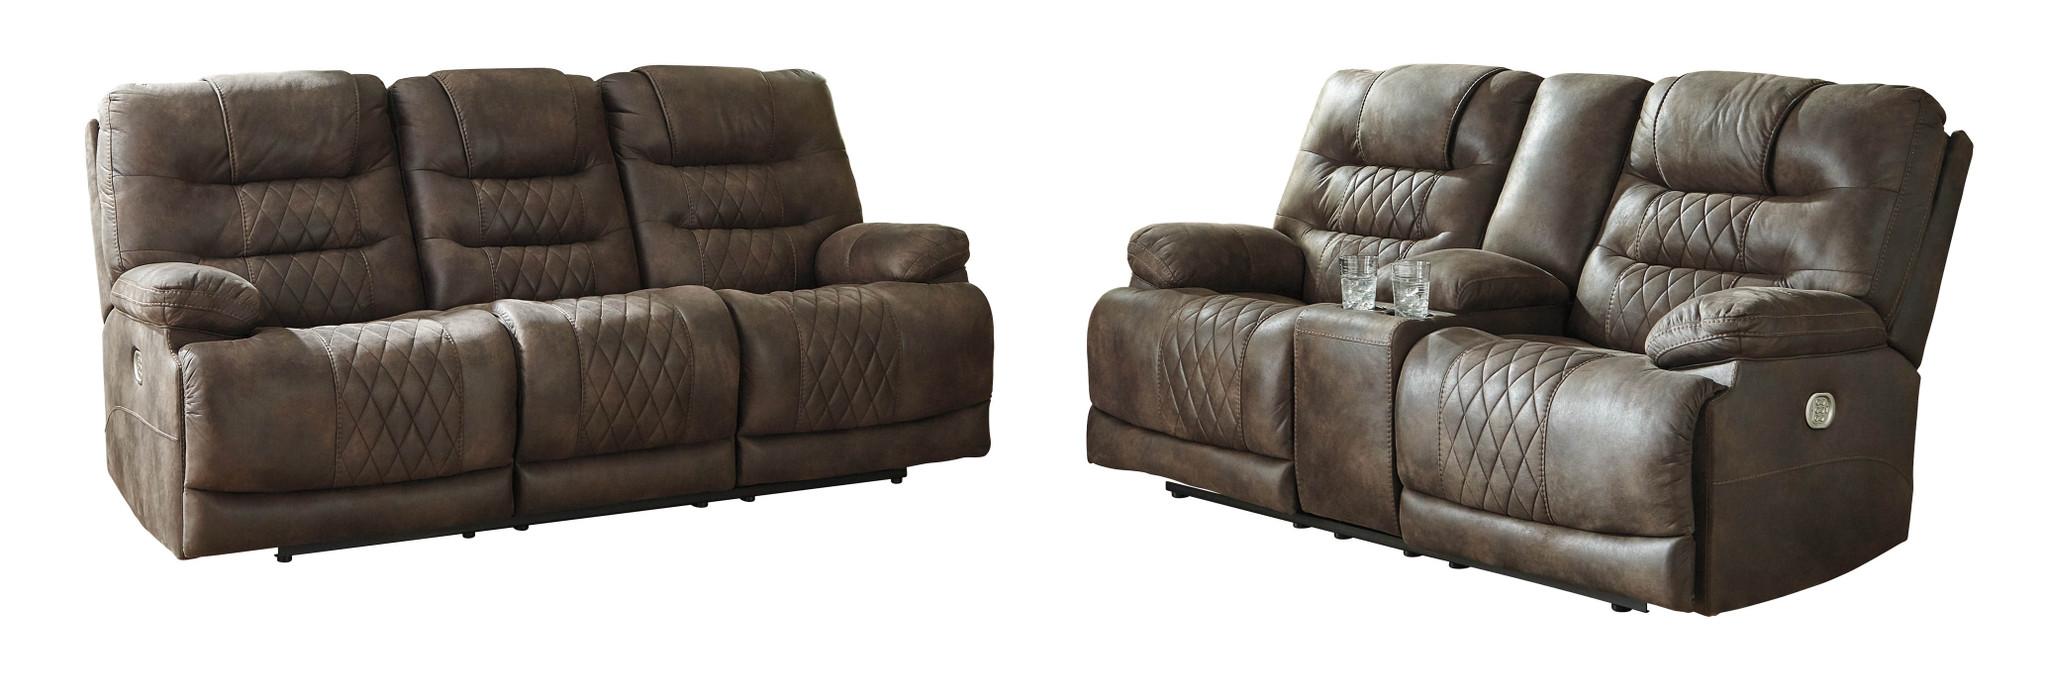 Sensational 2Pc Welsford Walnut Sofa And Loveseat Reclining Set Forskolin Free Trial Chair Design Images Forskolin Free Trialorg